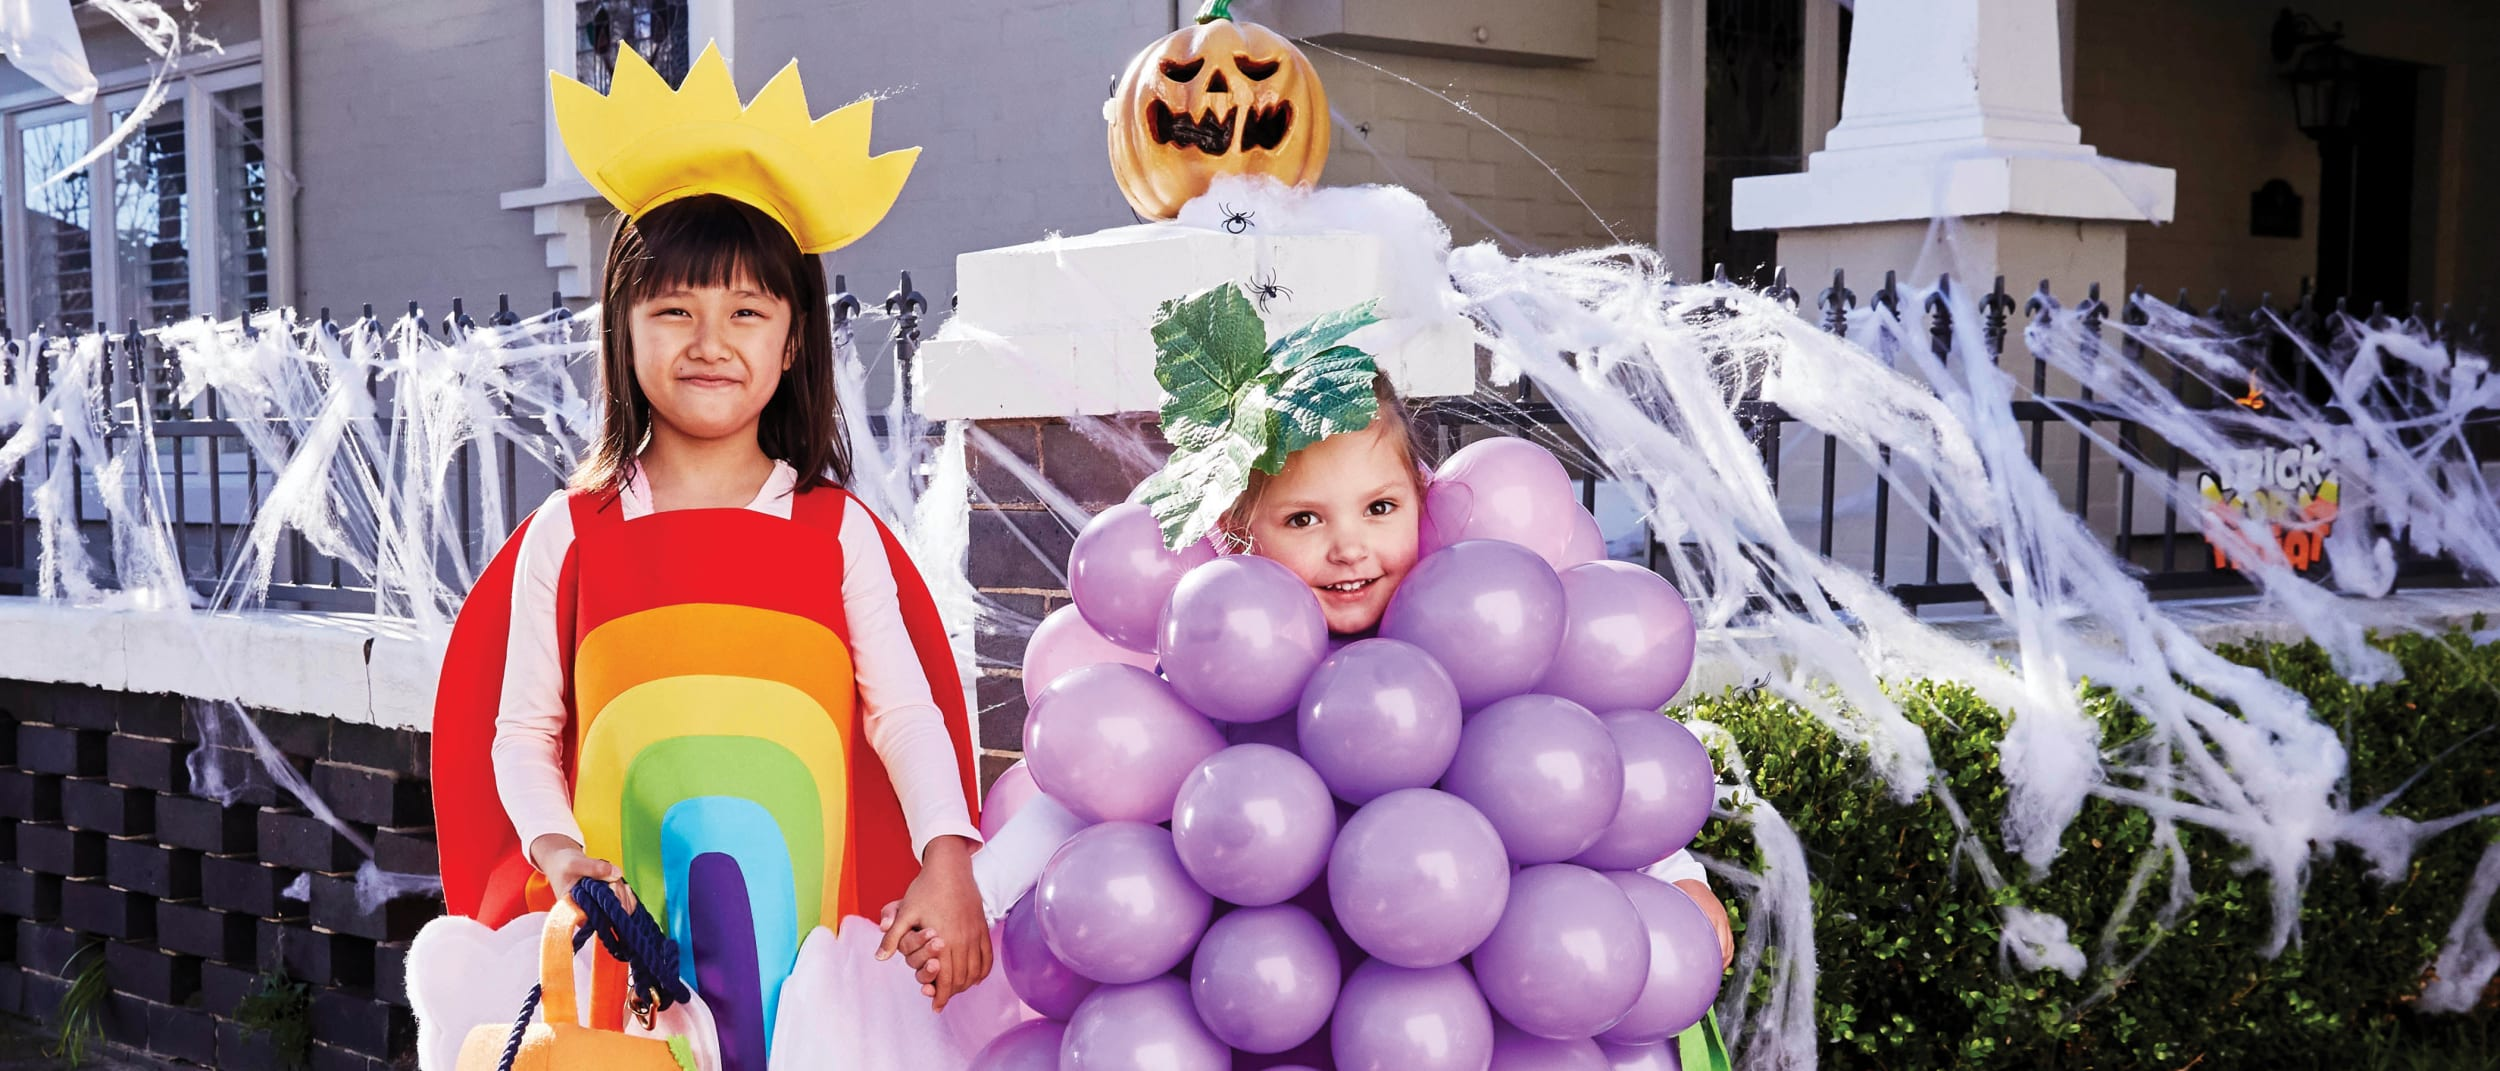 DIY Halloween kids' costume: balloon grapes